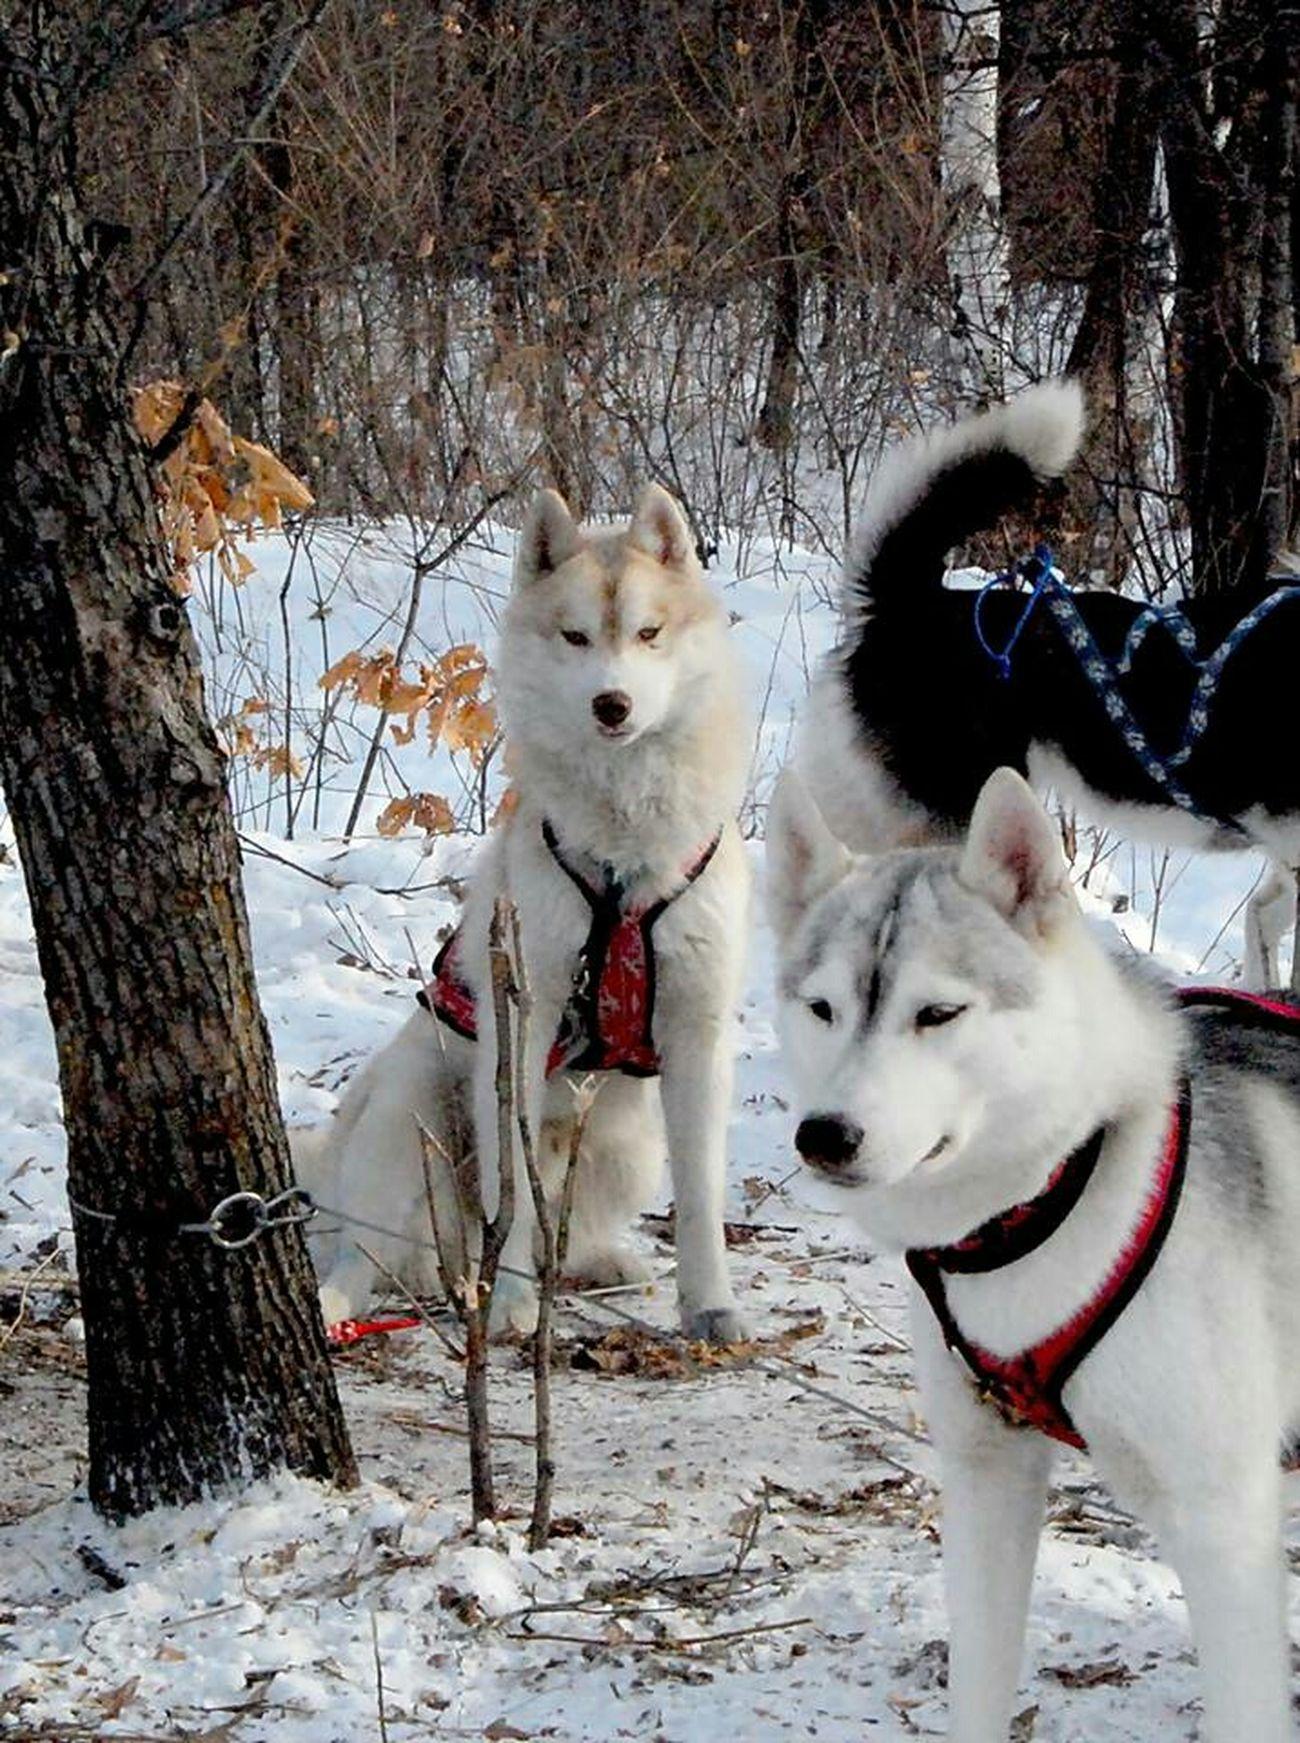 Starting A Trip Huskypuppy Husky Huskyphotography Husky Love Siberian Husky ХаскиСозданыДляЛаски ХаскиГолубыеГлазки хаскисозданныдляласки хаски